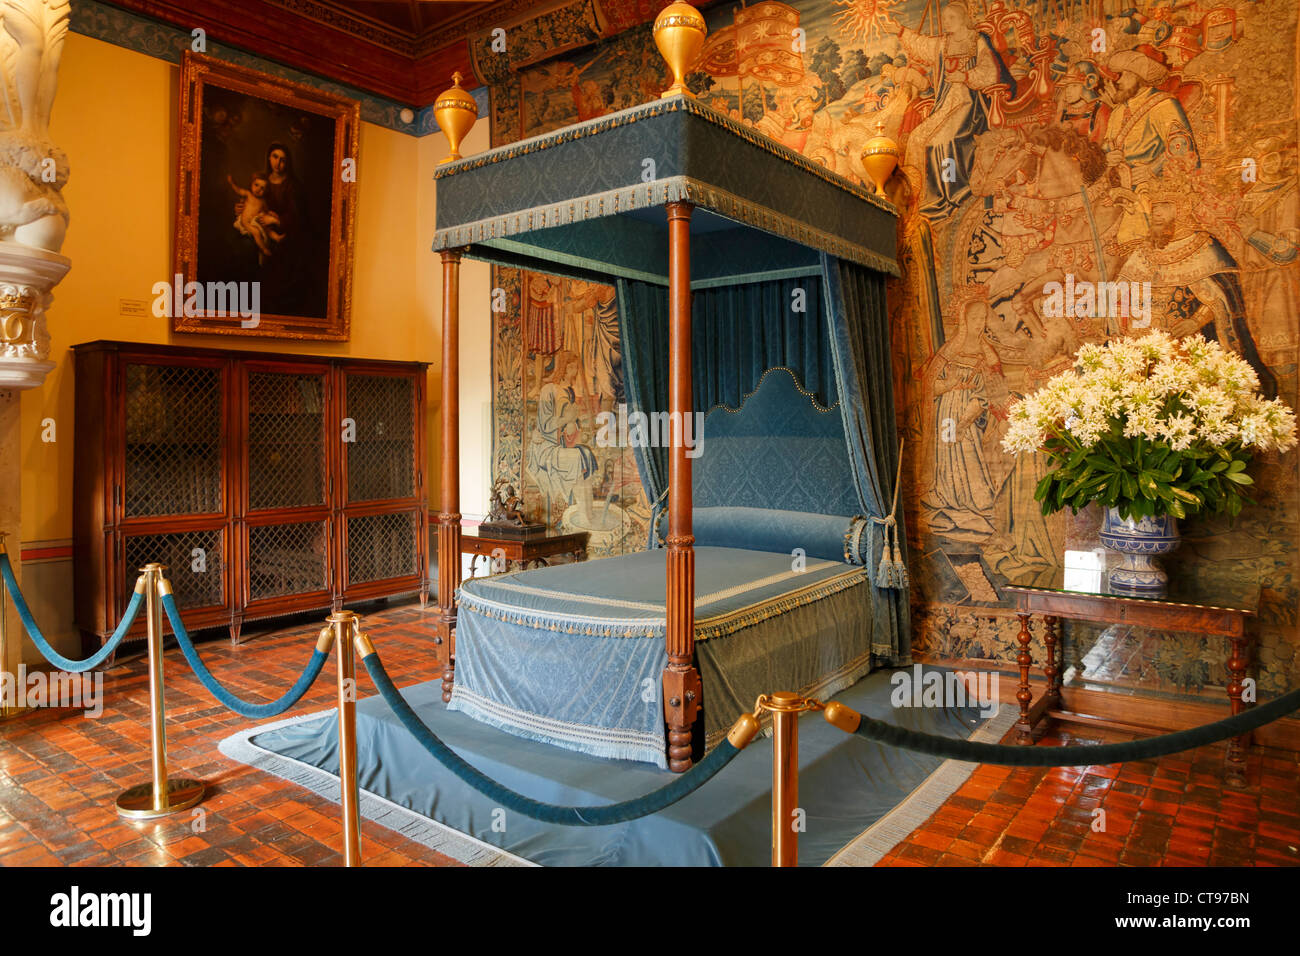 16th Century French Home - diane-de-poitiers-bedroom-chateau-chenonceau-france-renaissance-four-CT97BN_Most Inspiring 16th Century French Home - diane-de-poitiers-bedroom-chateau-chenonceau-france-renaissance-four-CT97BN  Pic_833916.jpg